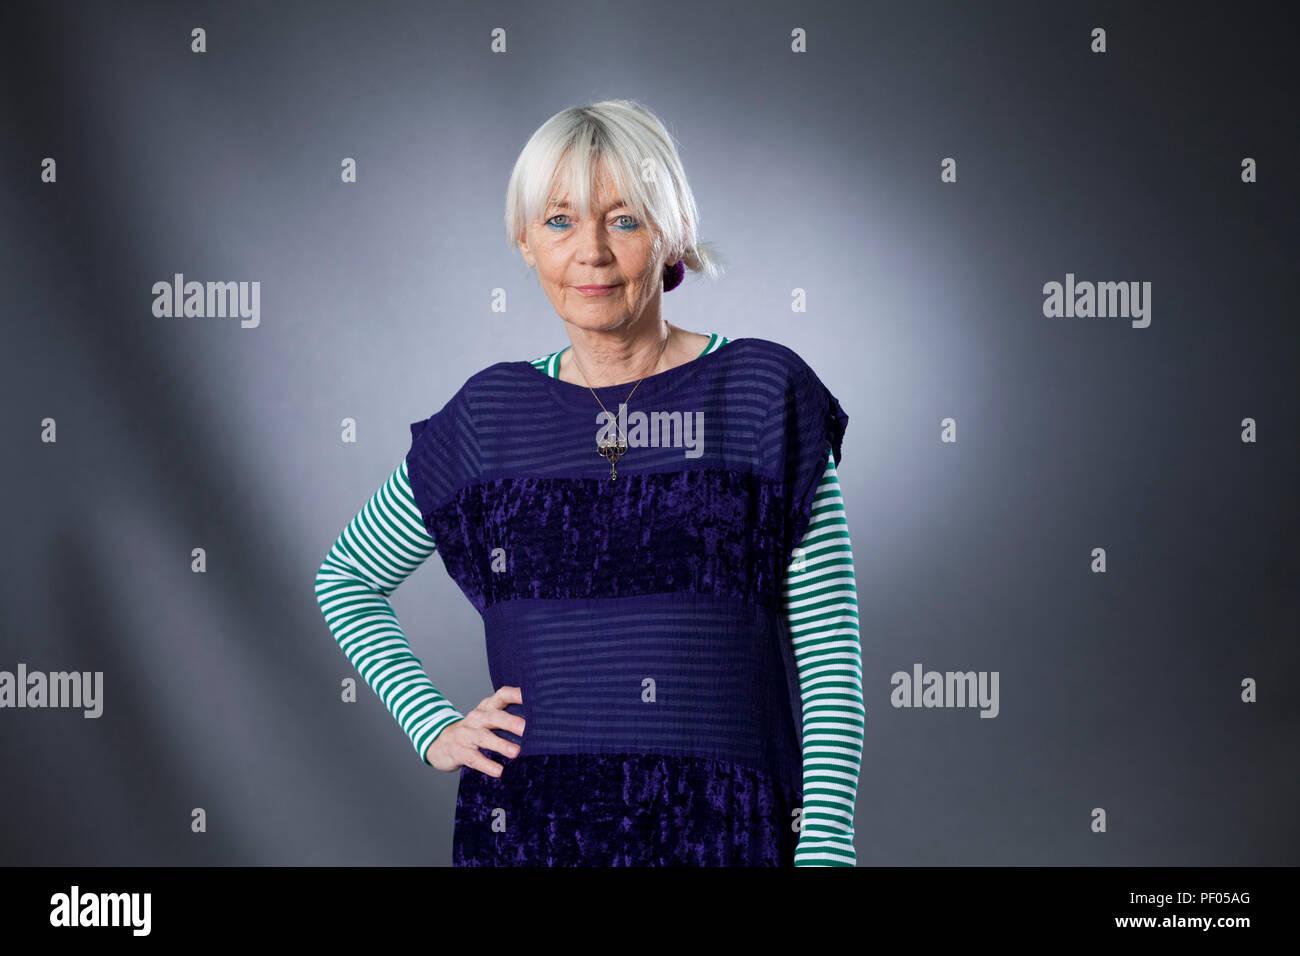 Edinburgh, UK  18th August, 2018  Diane Atkinson is a British